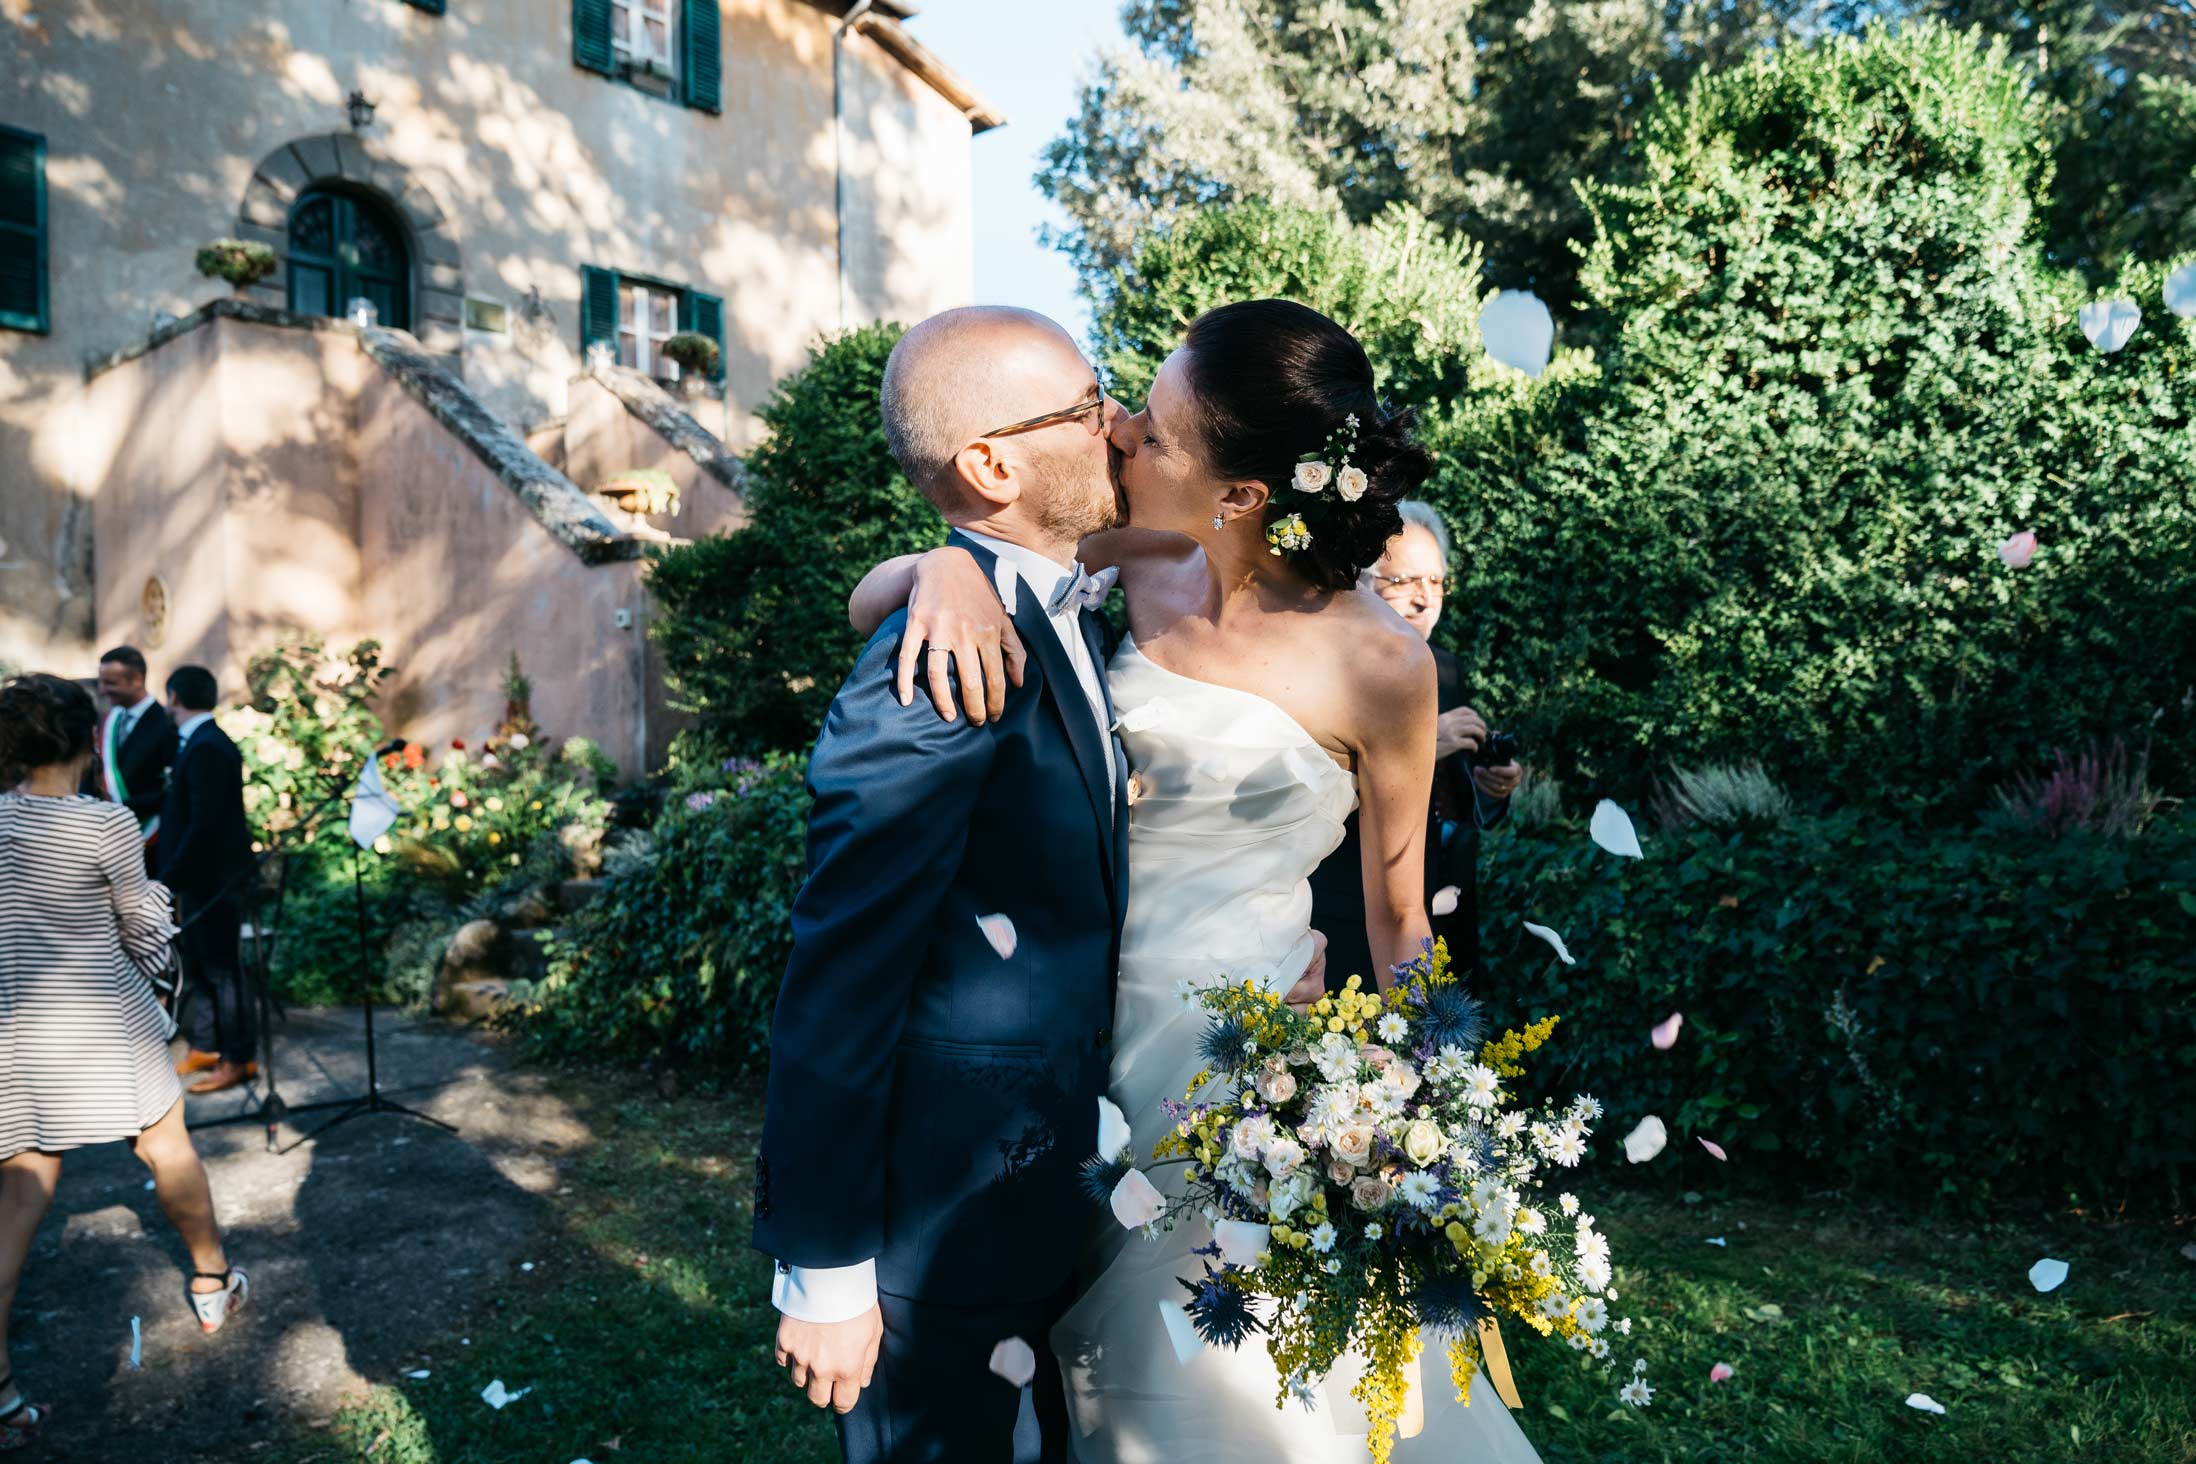 Fotoreportage-Matrimonio-Fotografo-Matrimonio-Roma-L&F